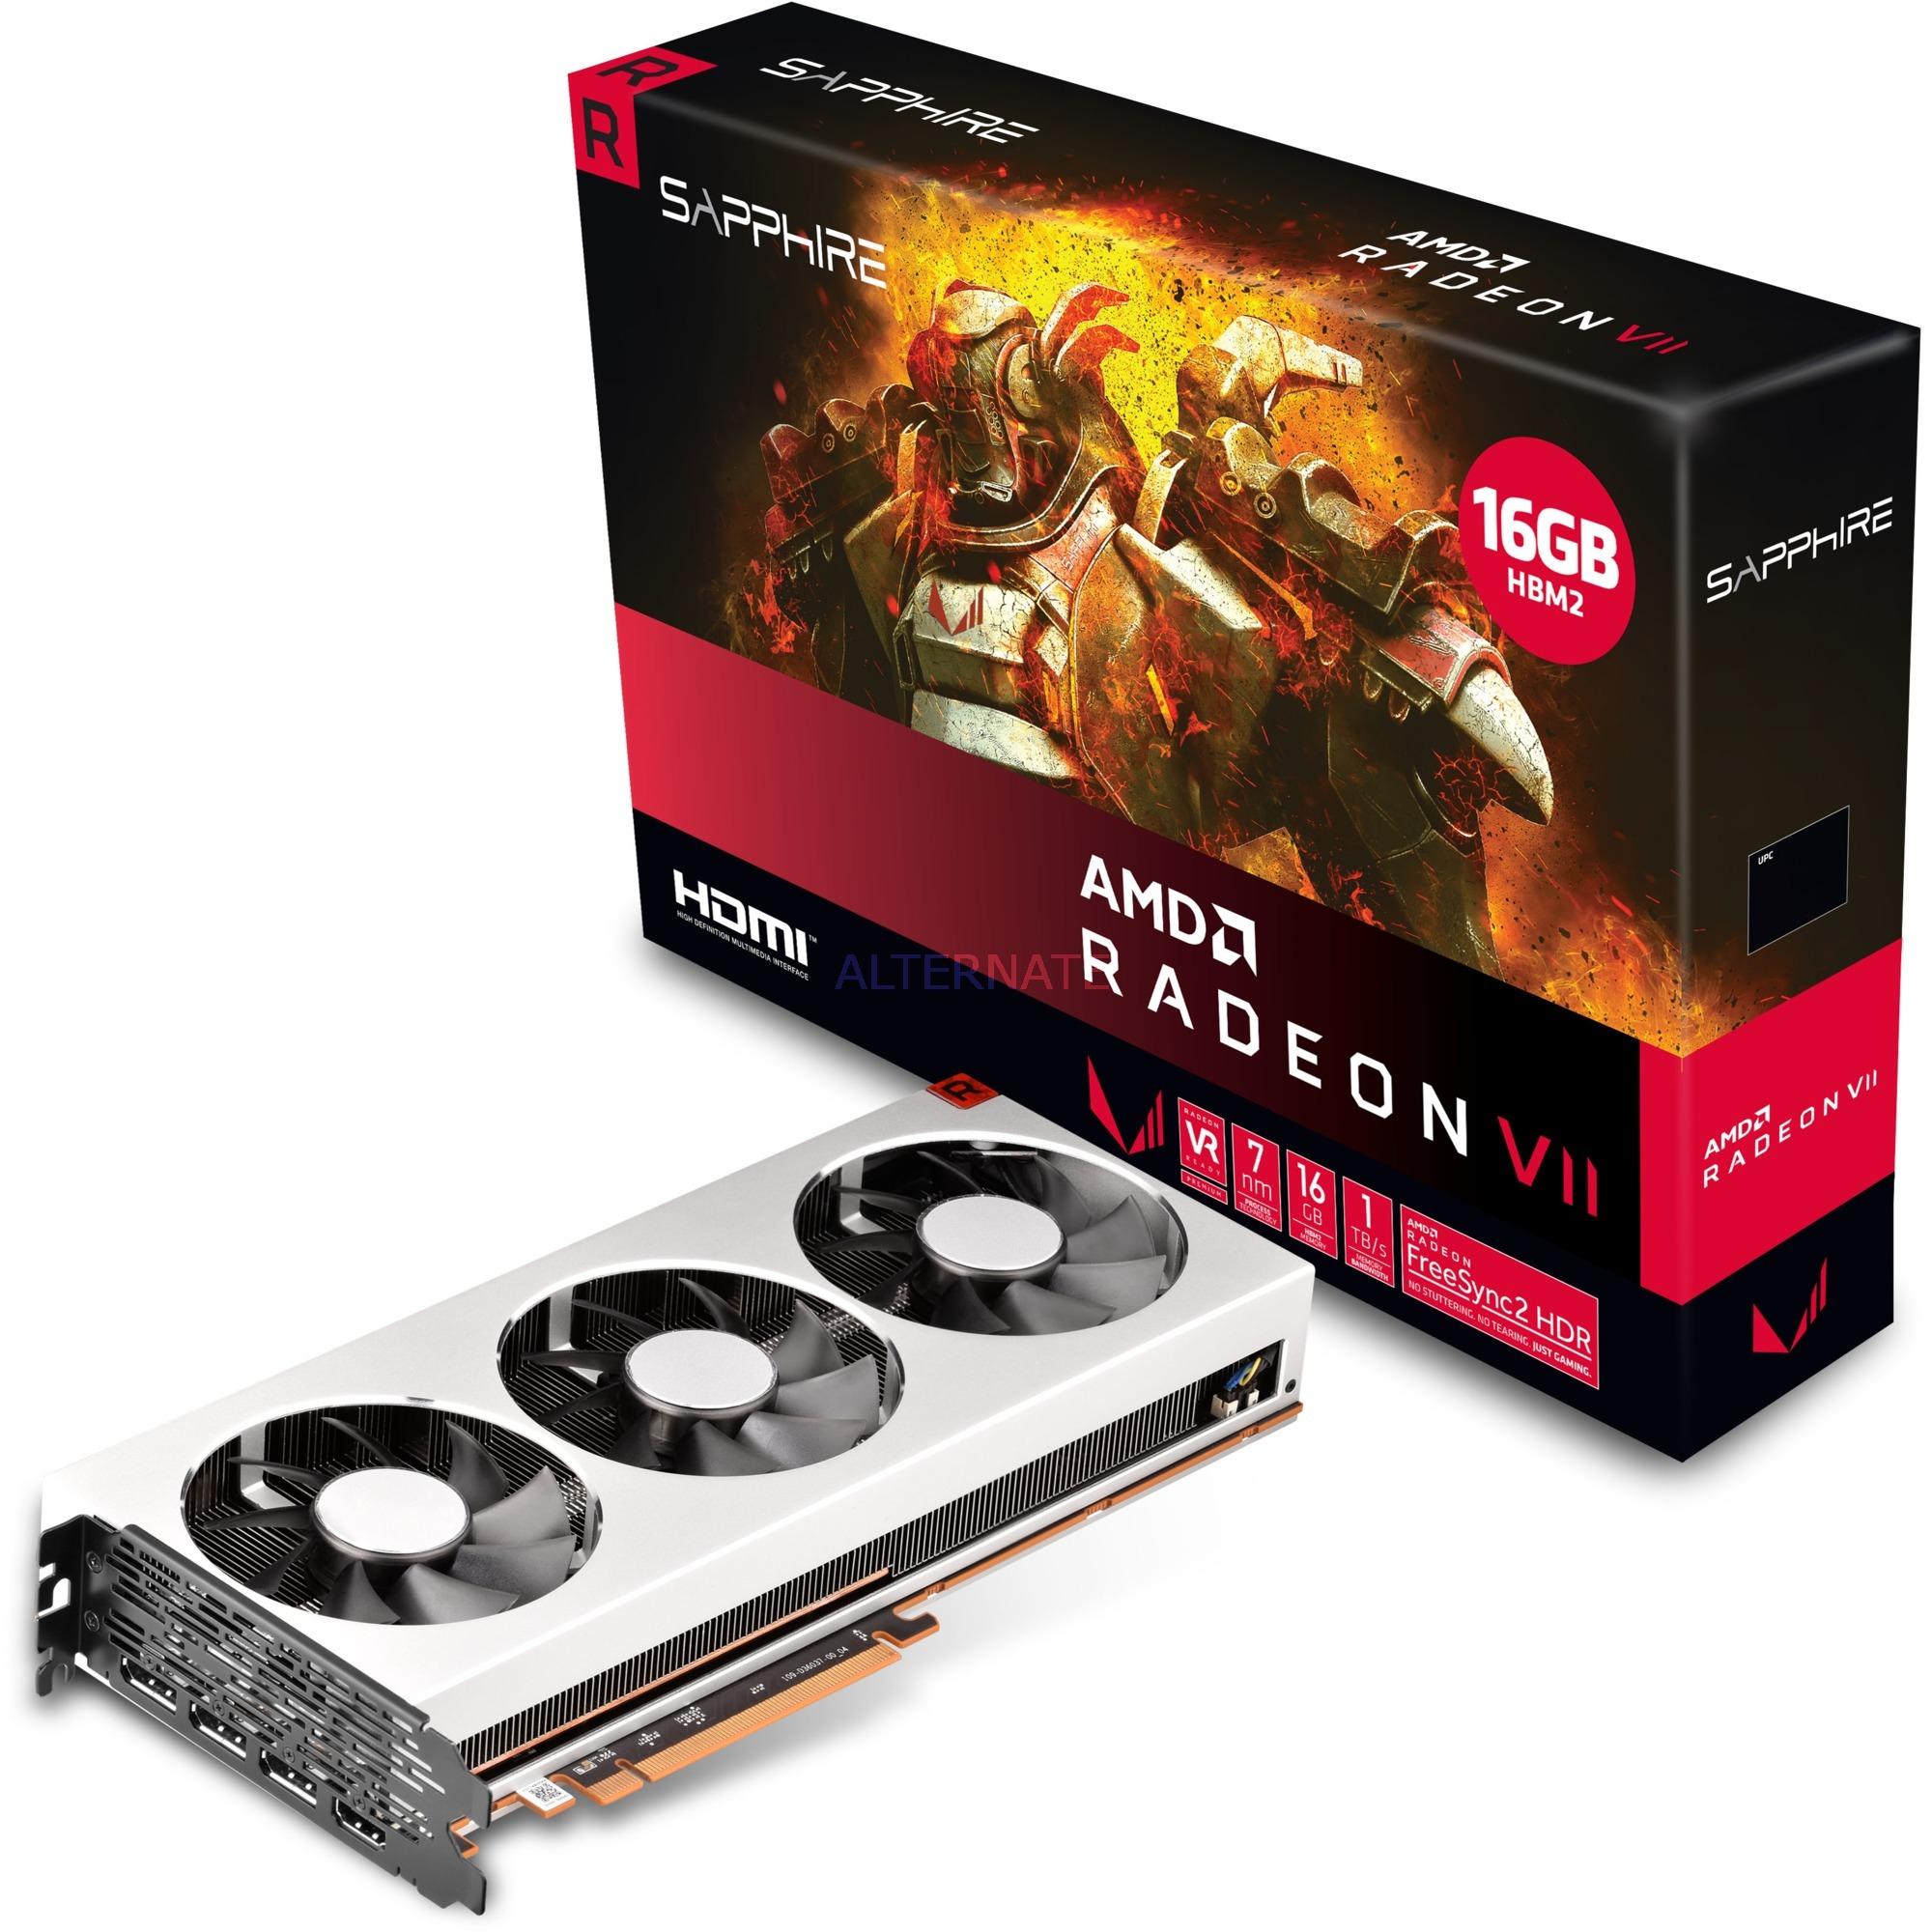 Radeon VII 16G HBM2 16 GB Memoria de alto ancho de banda de segunda generación (HBM2), Tarjeta gráfica